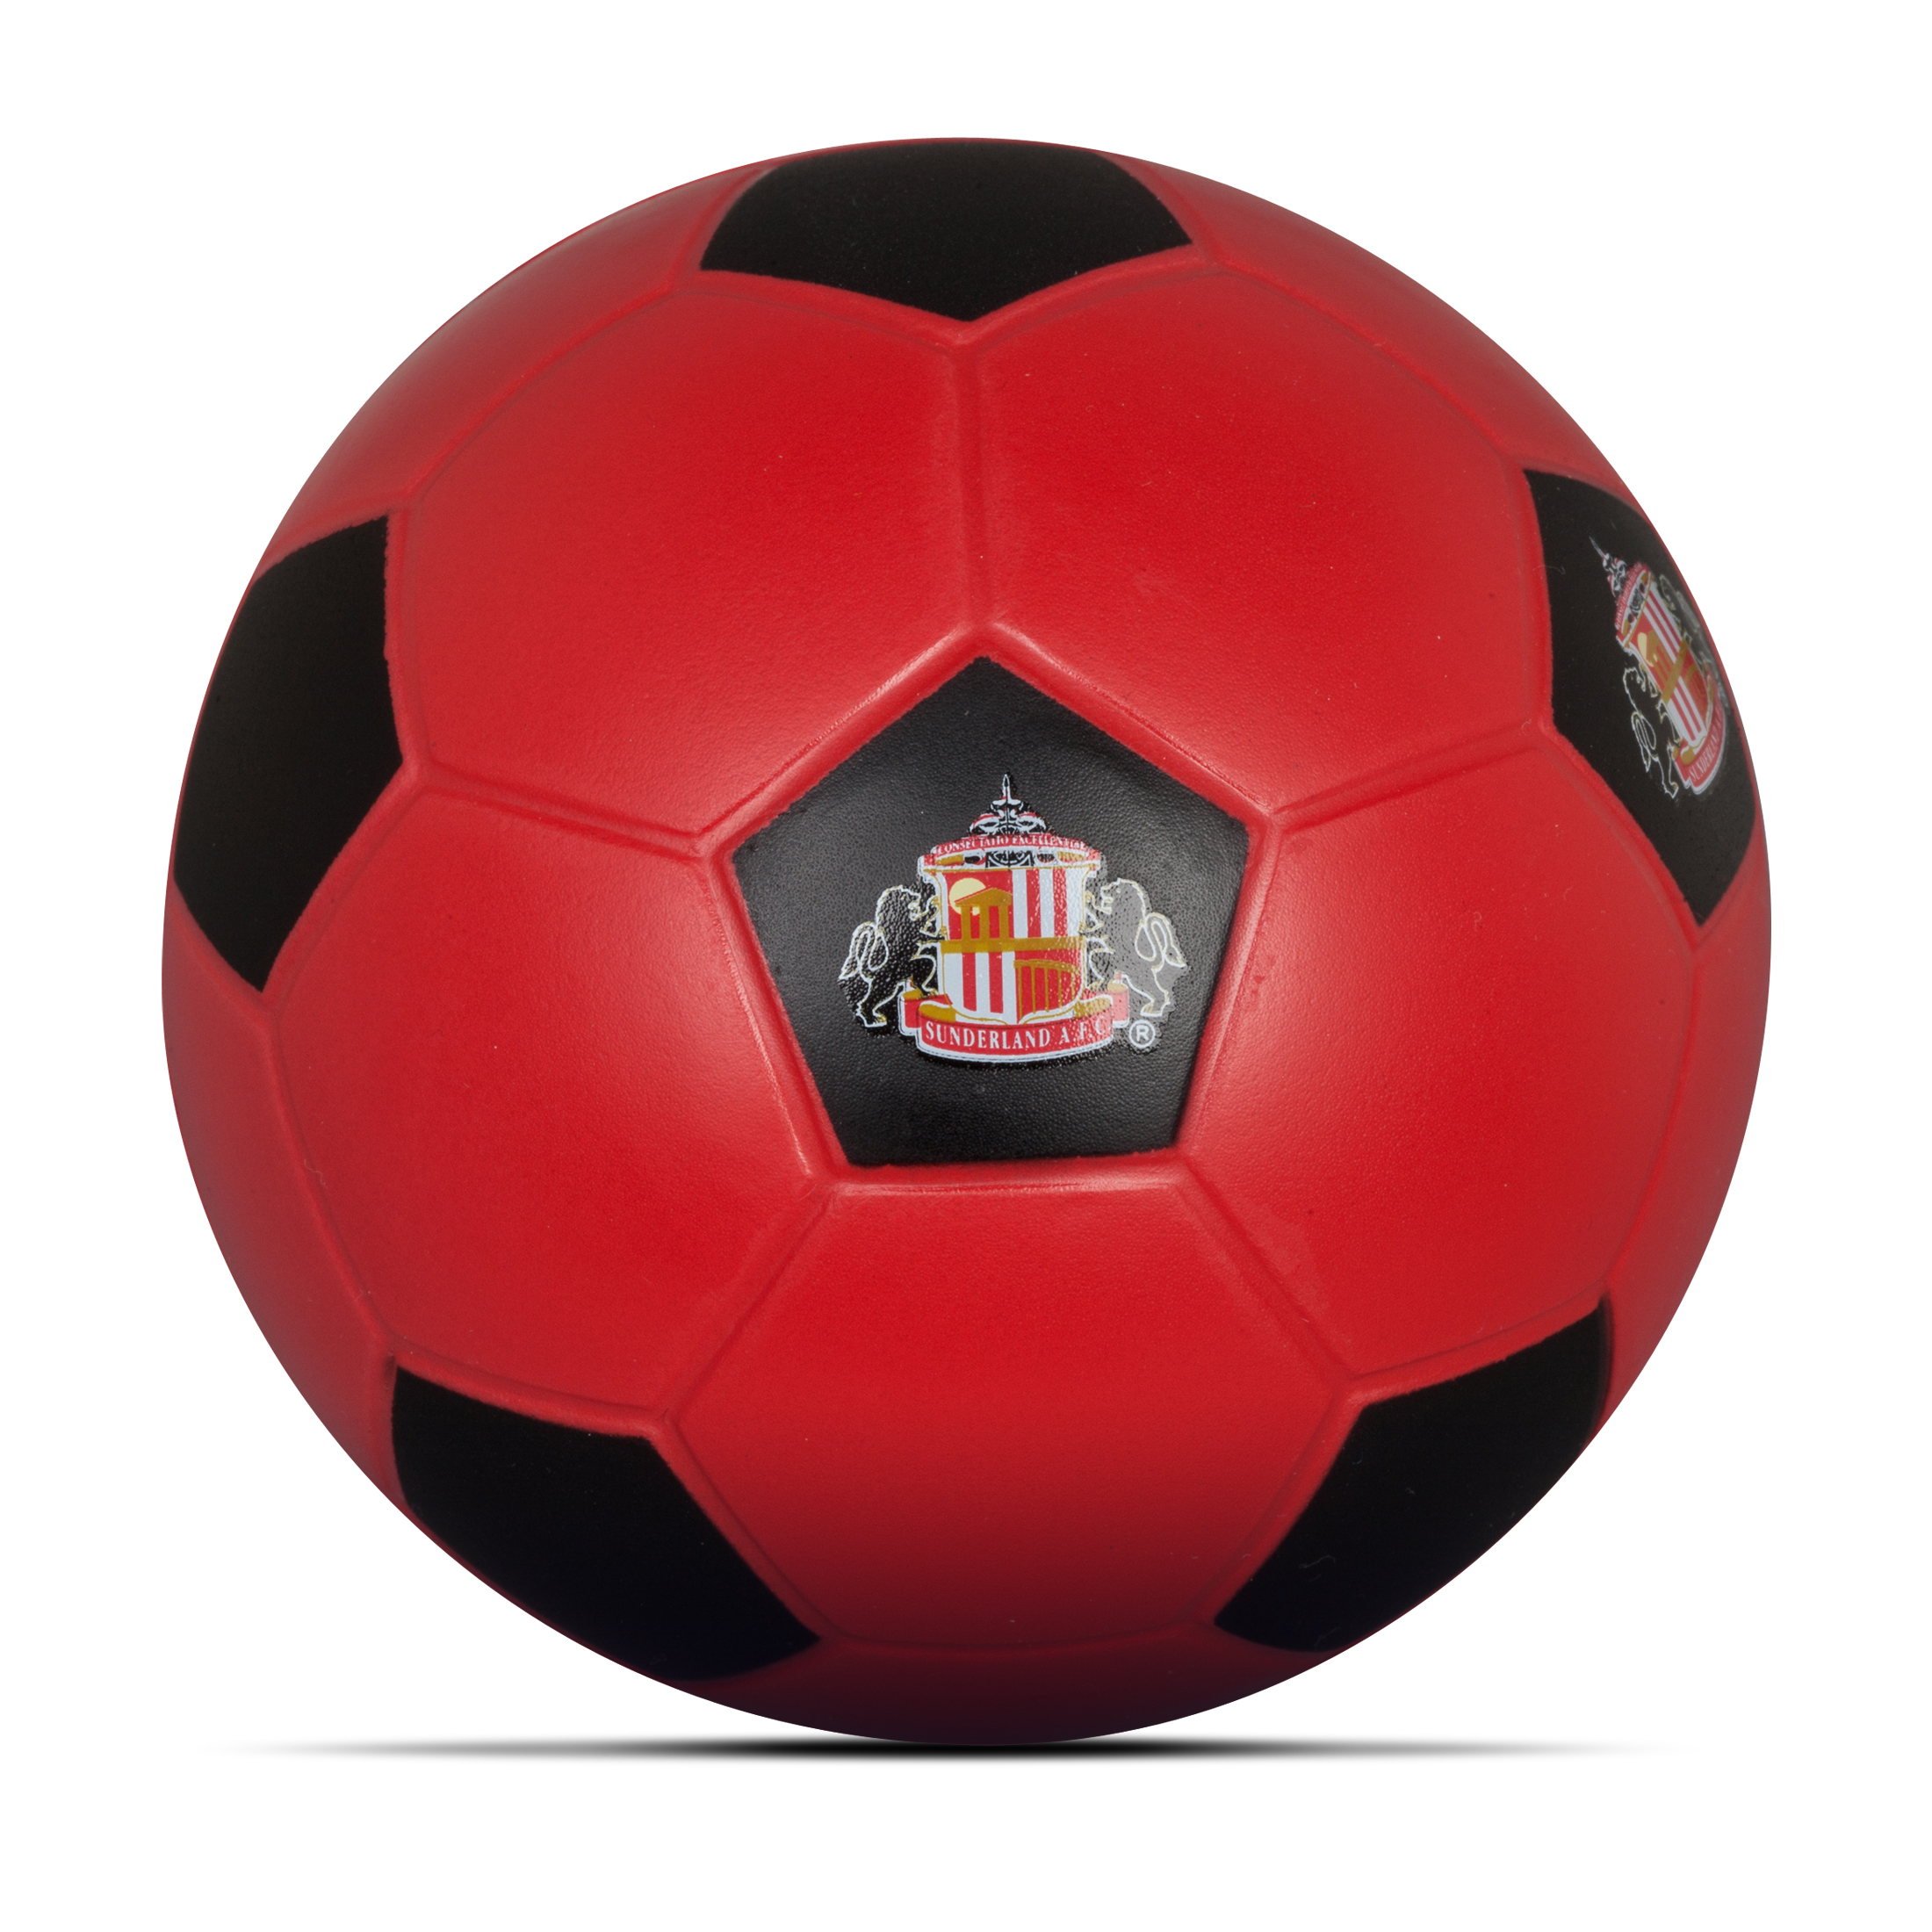 Sunderland Core 4inch Mini Ball in Clampack